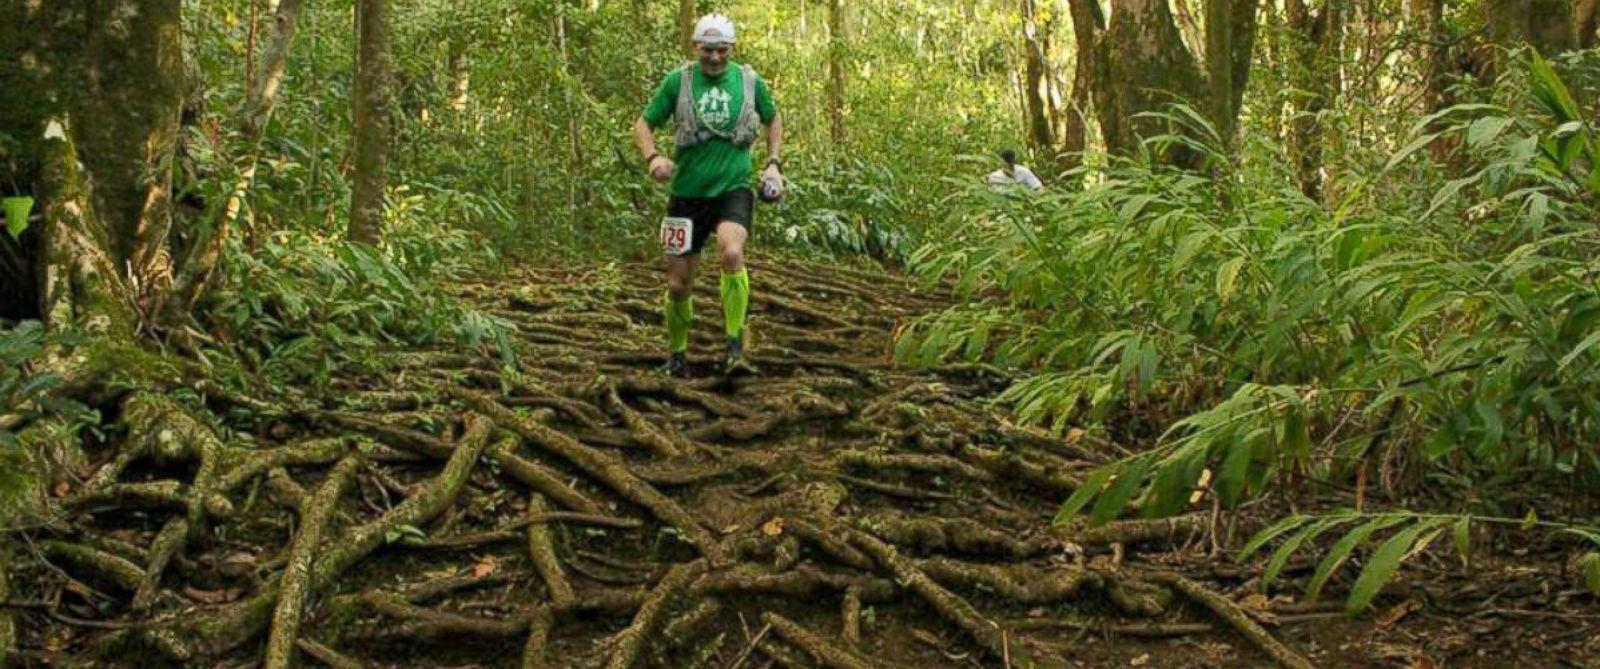 PHOTO: Gavin Woody runs the HURT 100 miler in Oahu, Hawaii last week